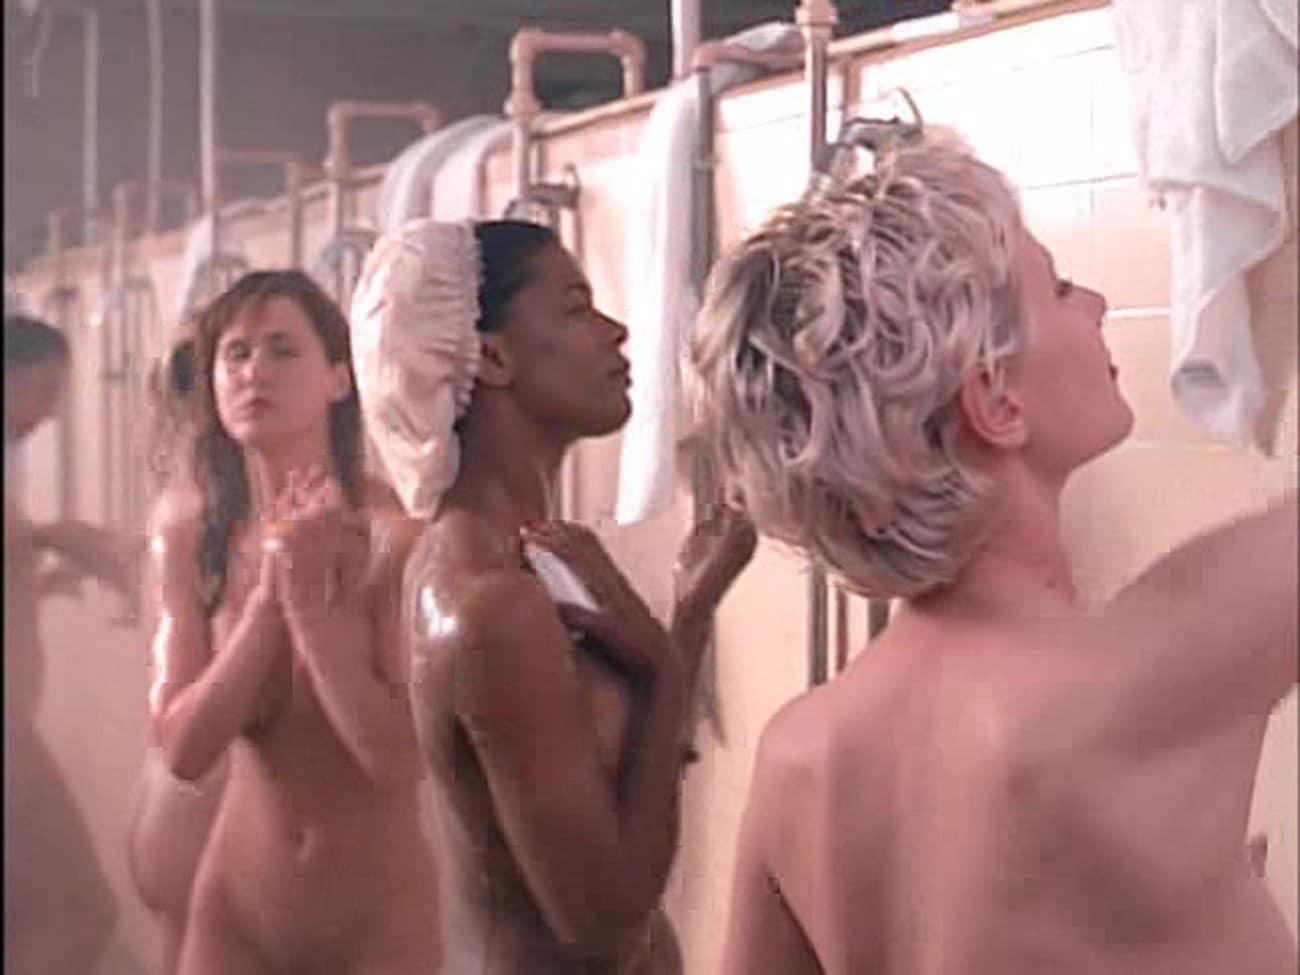 Stripes shower girls nude in stripes shower girls